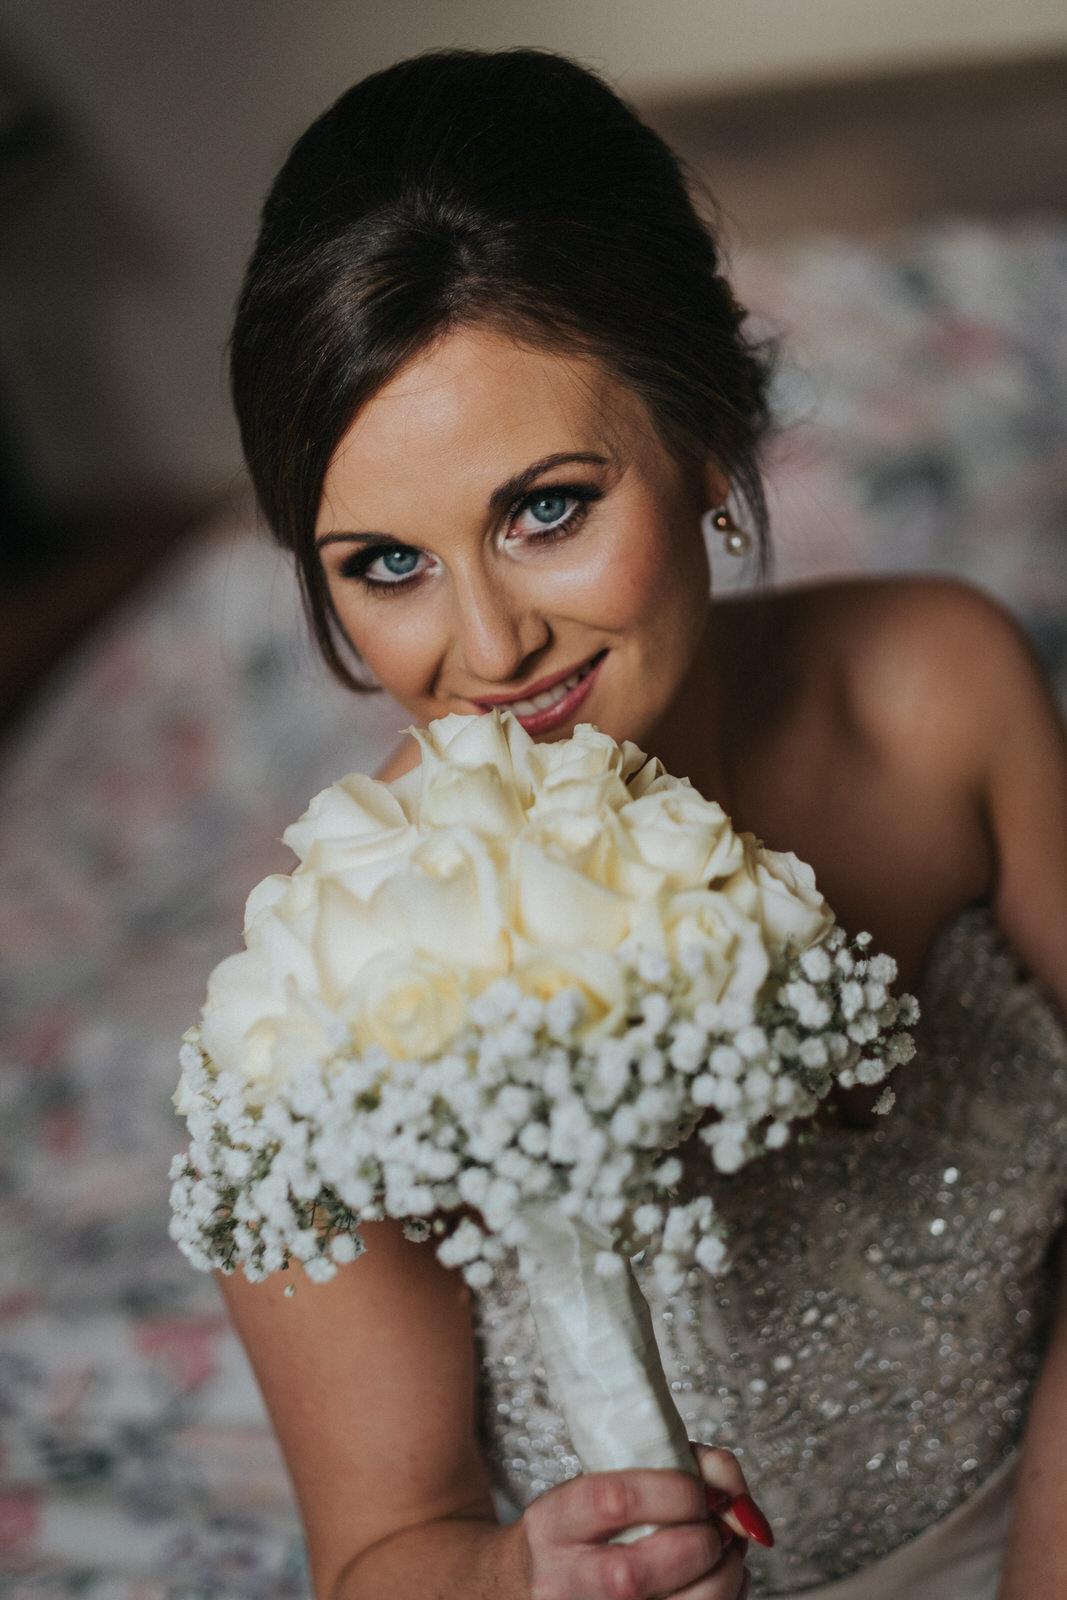 Clonabreany_wedding-photographer_roger_kenny_ireland_023.jpg